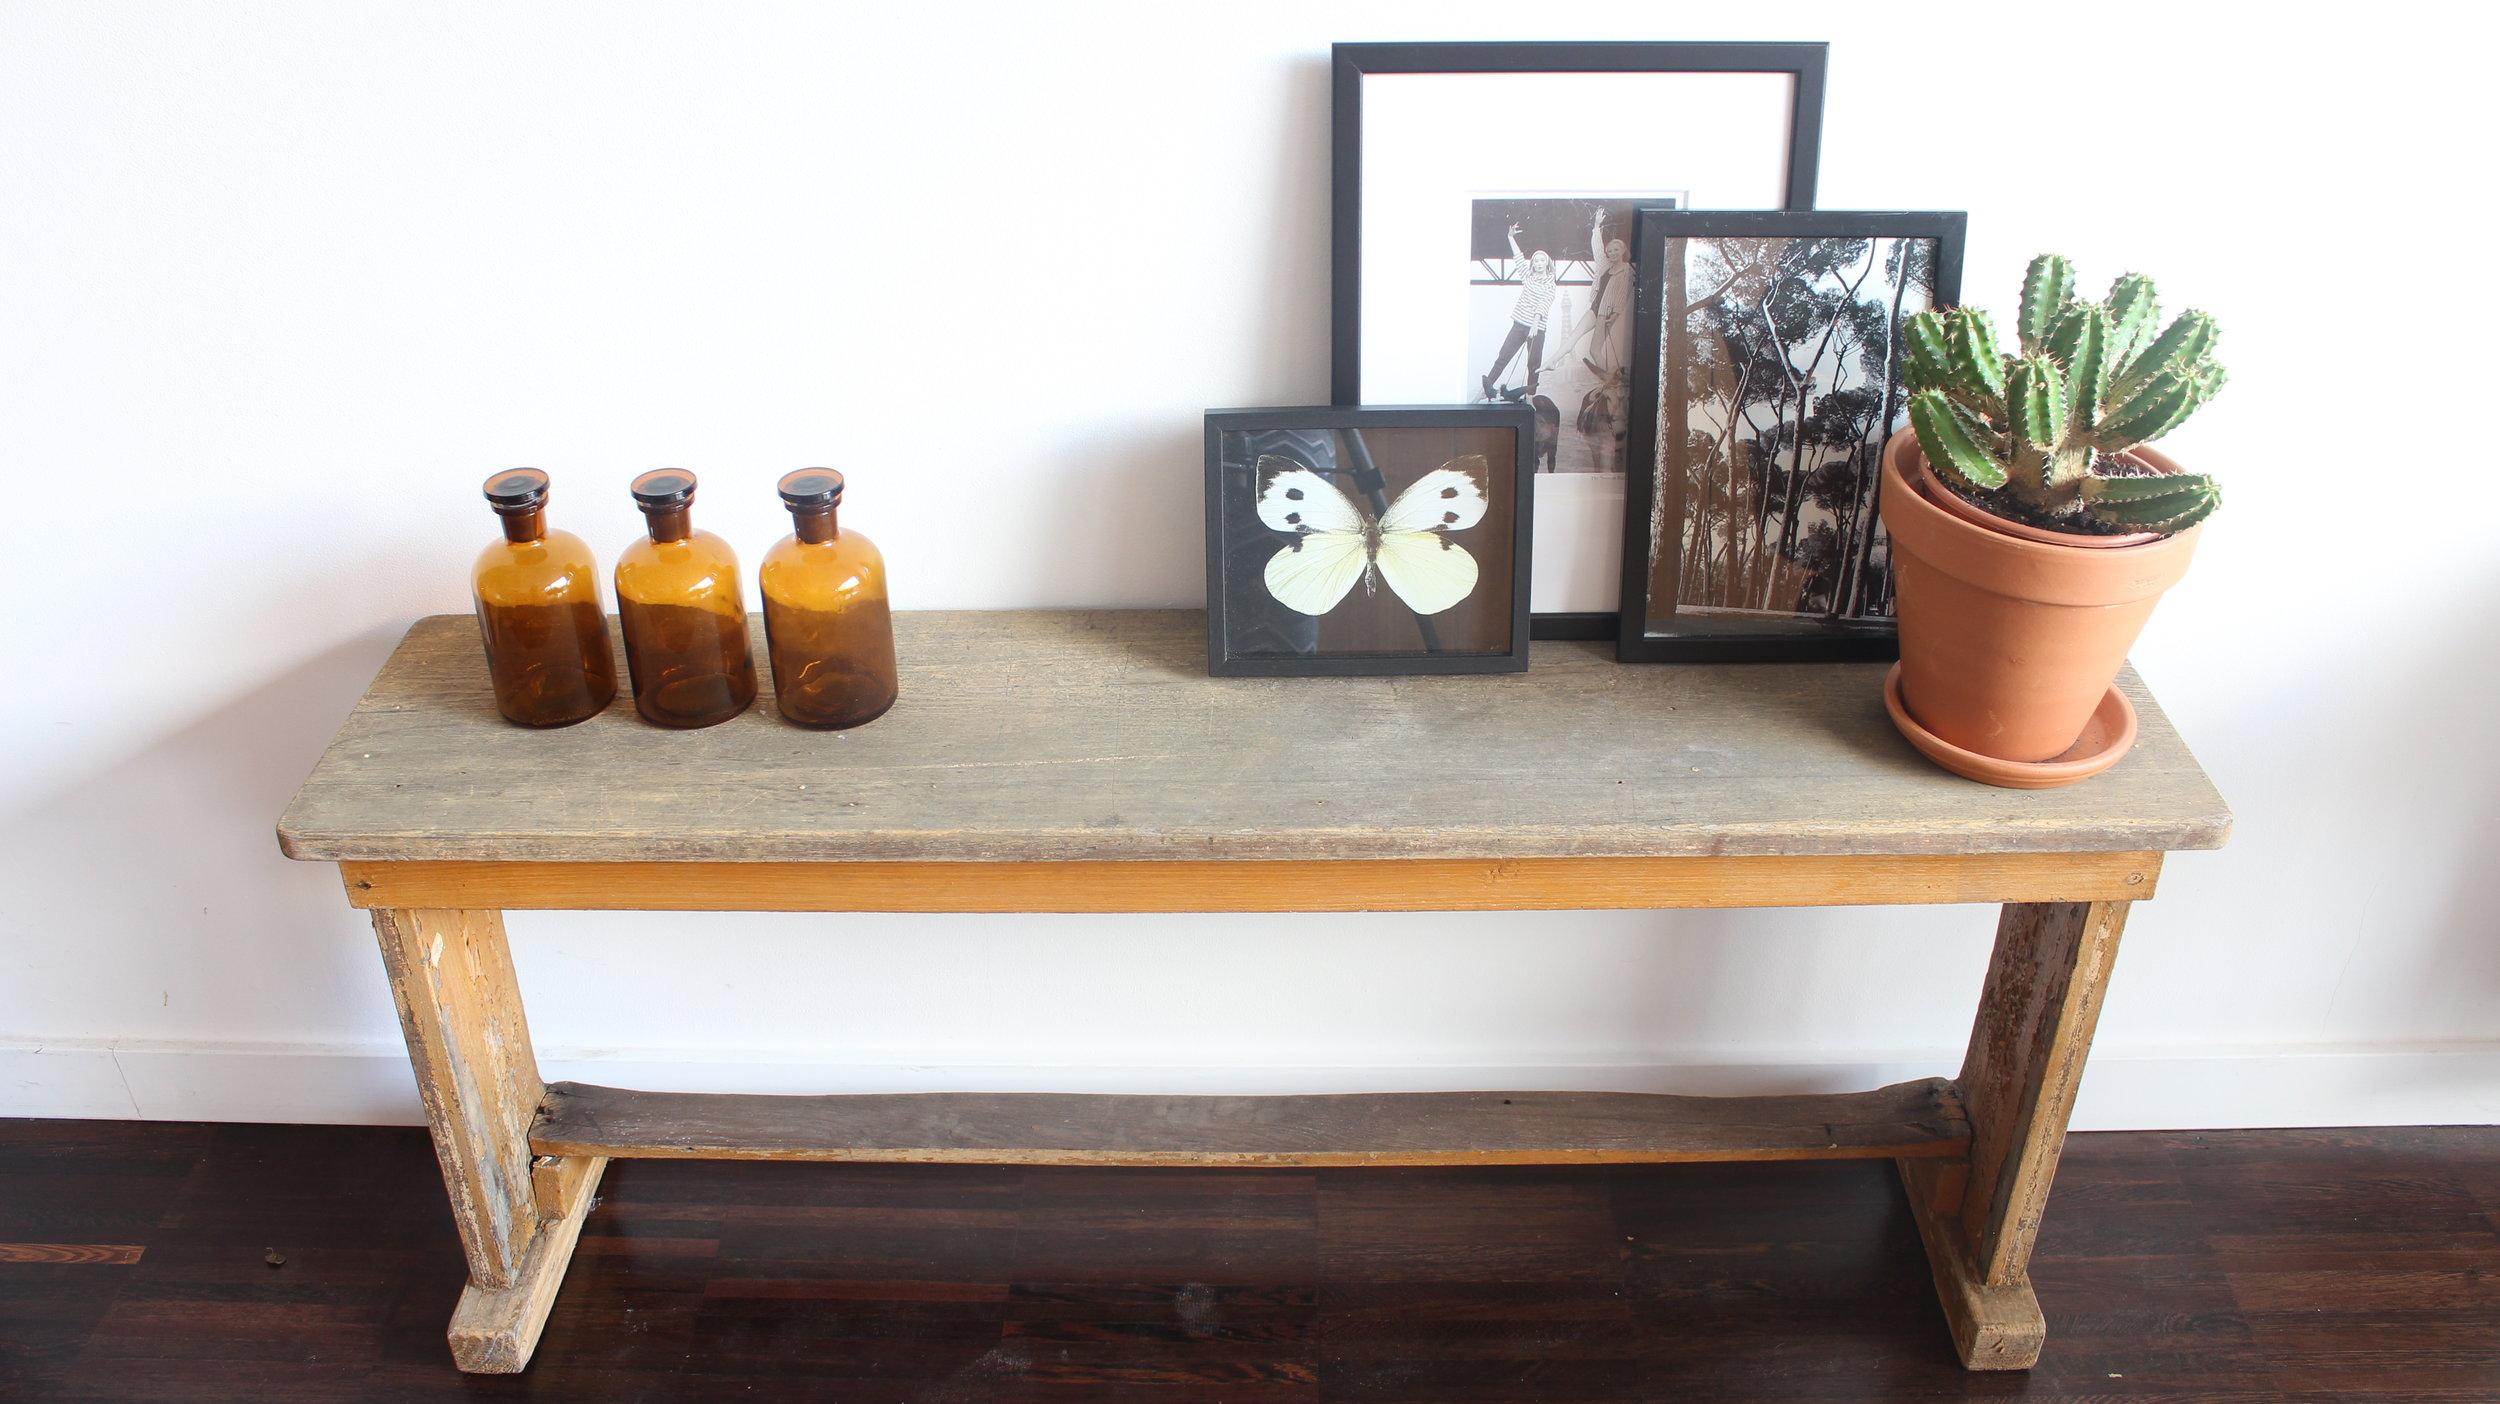 Houten Bankje Slaapkamer : Houten bank decoratie houten bankje decoratie beypeople live